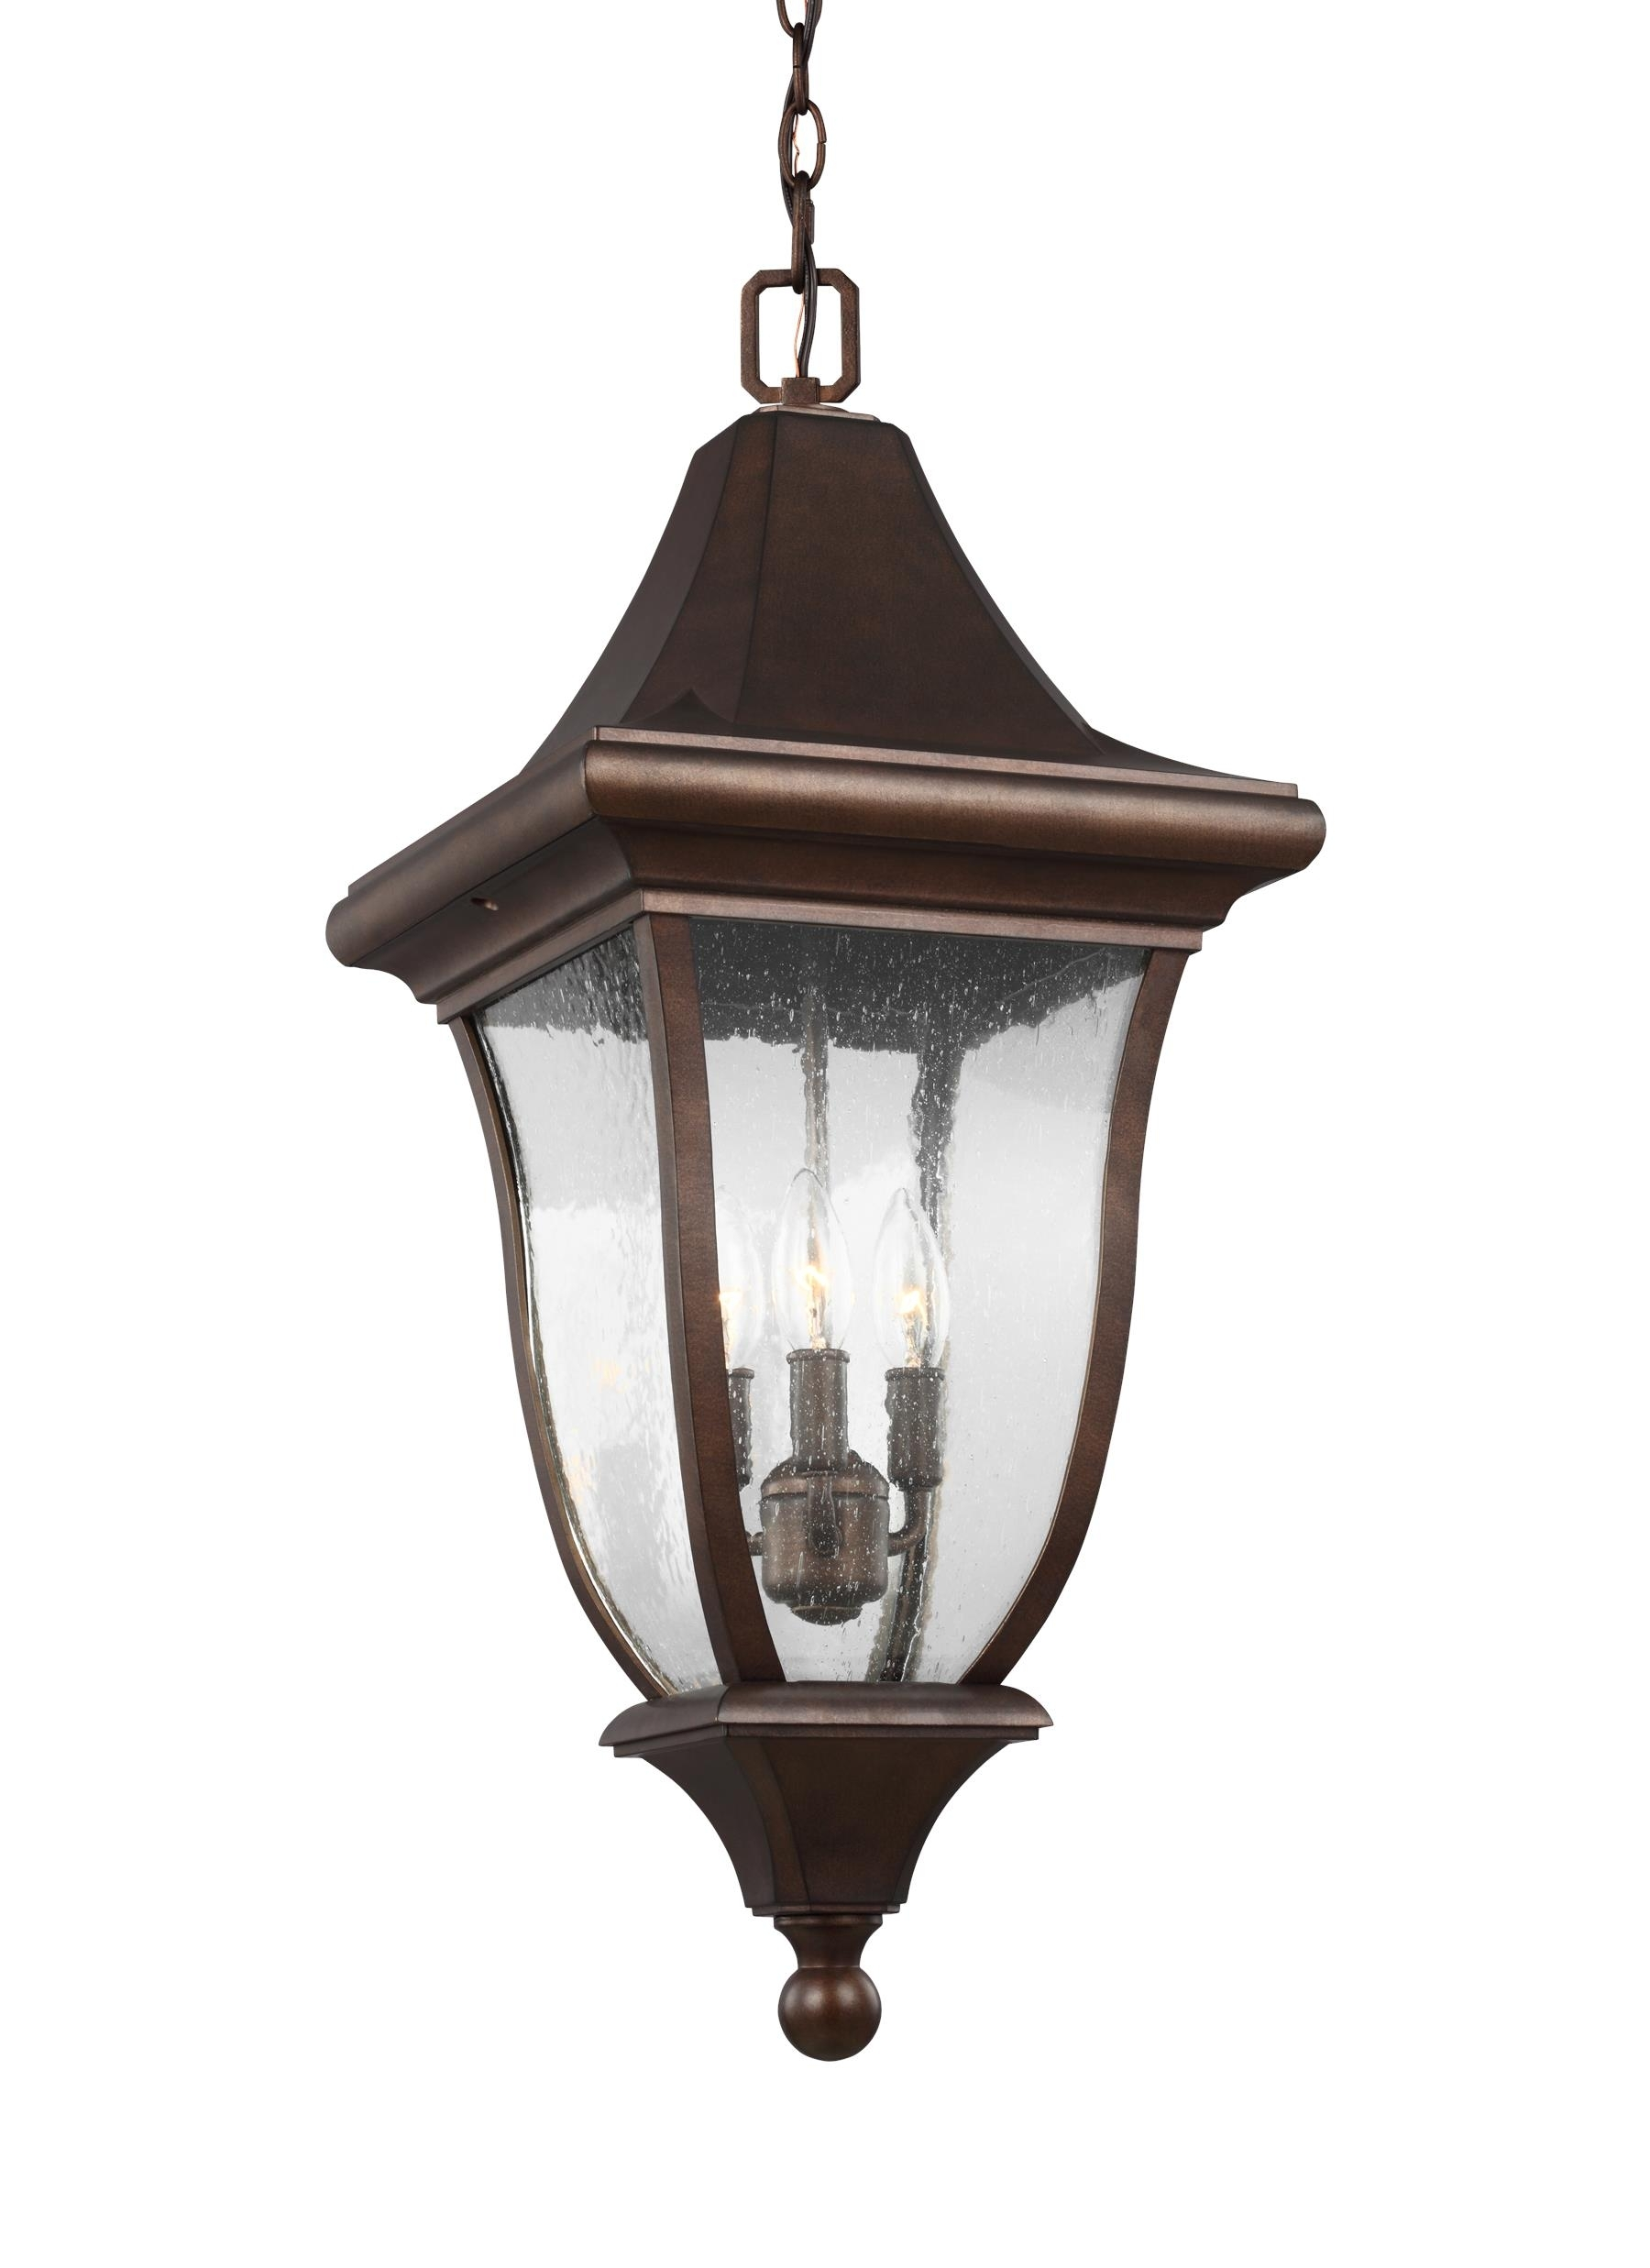 Ol13109ptbz,3 – Light Outdoor Pendant Lantern,patina Bronze Intended For Vintage Outdoor Lanterns (View 12 of 20)